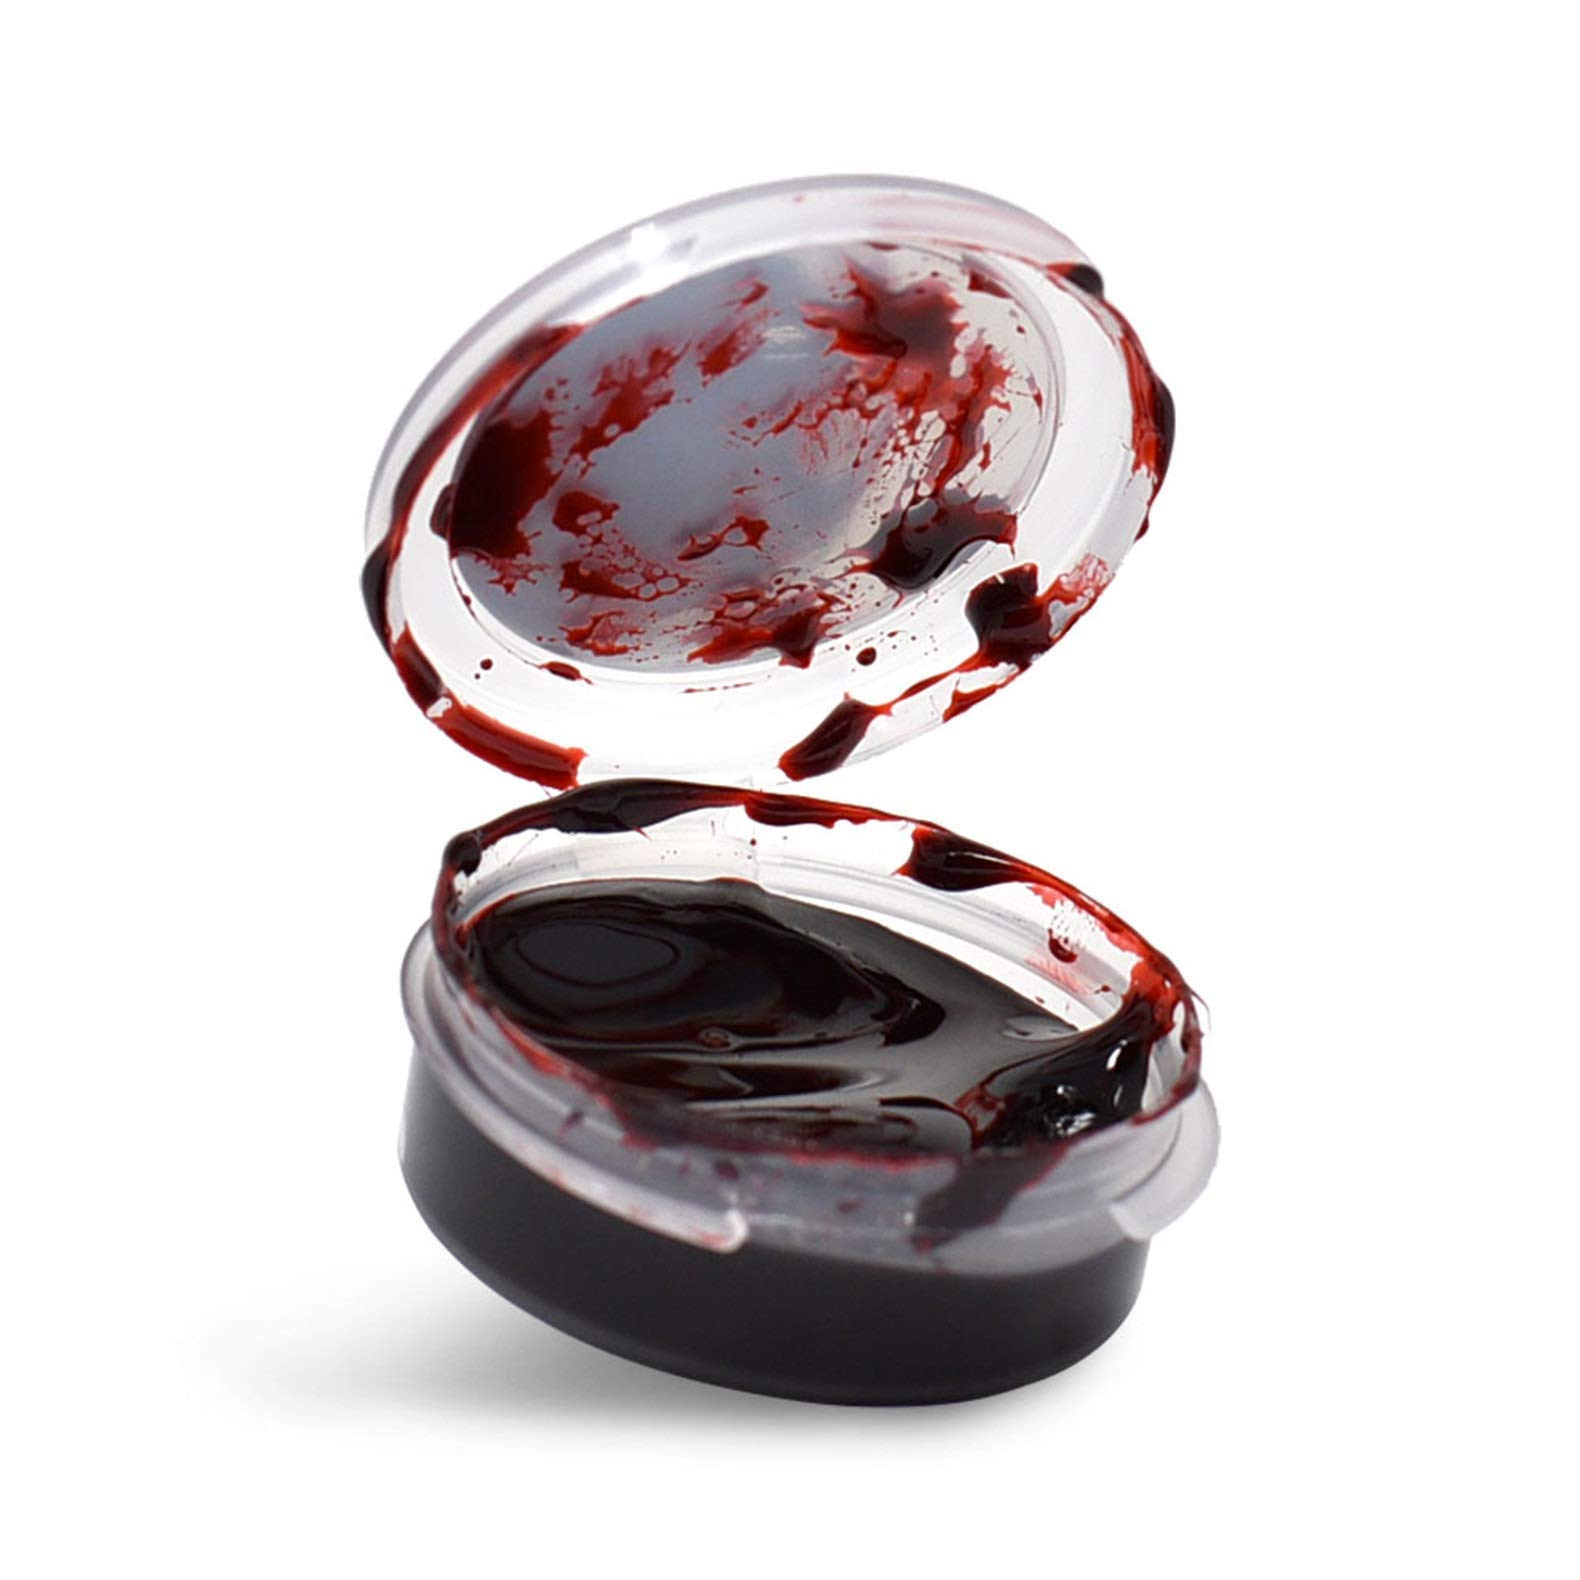 Mehron Makeup Coagulated Blood Gel (.5 oz),Red